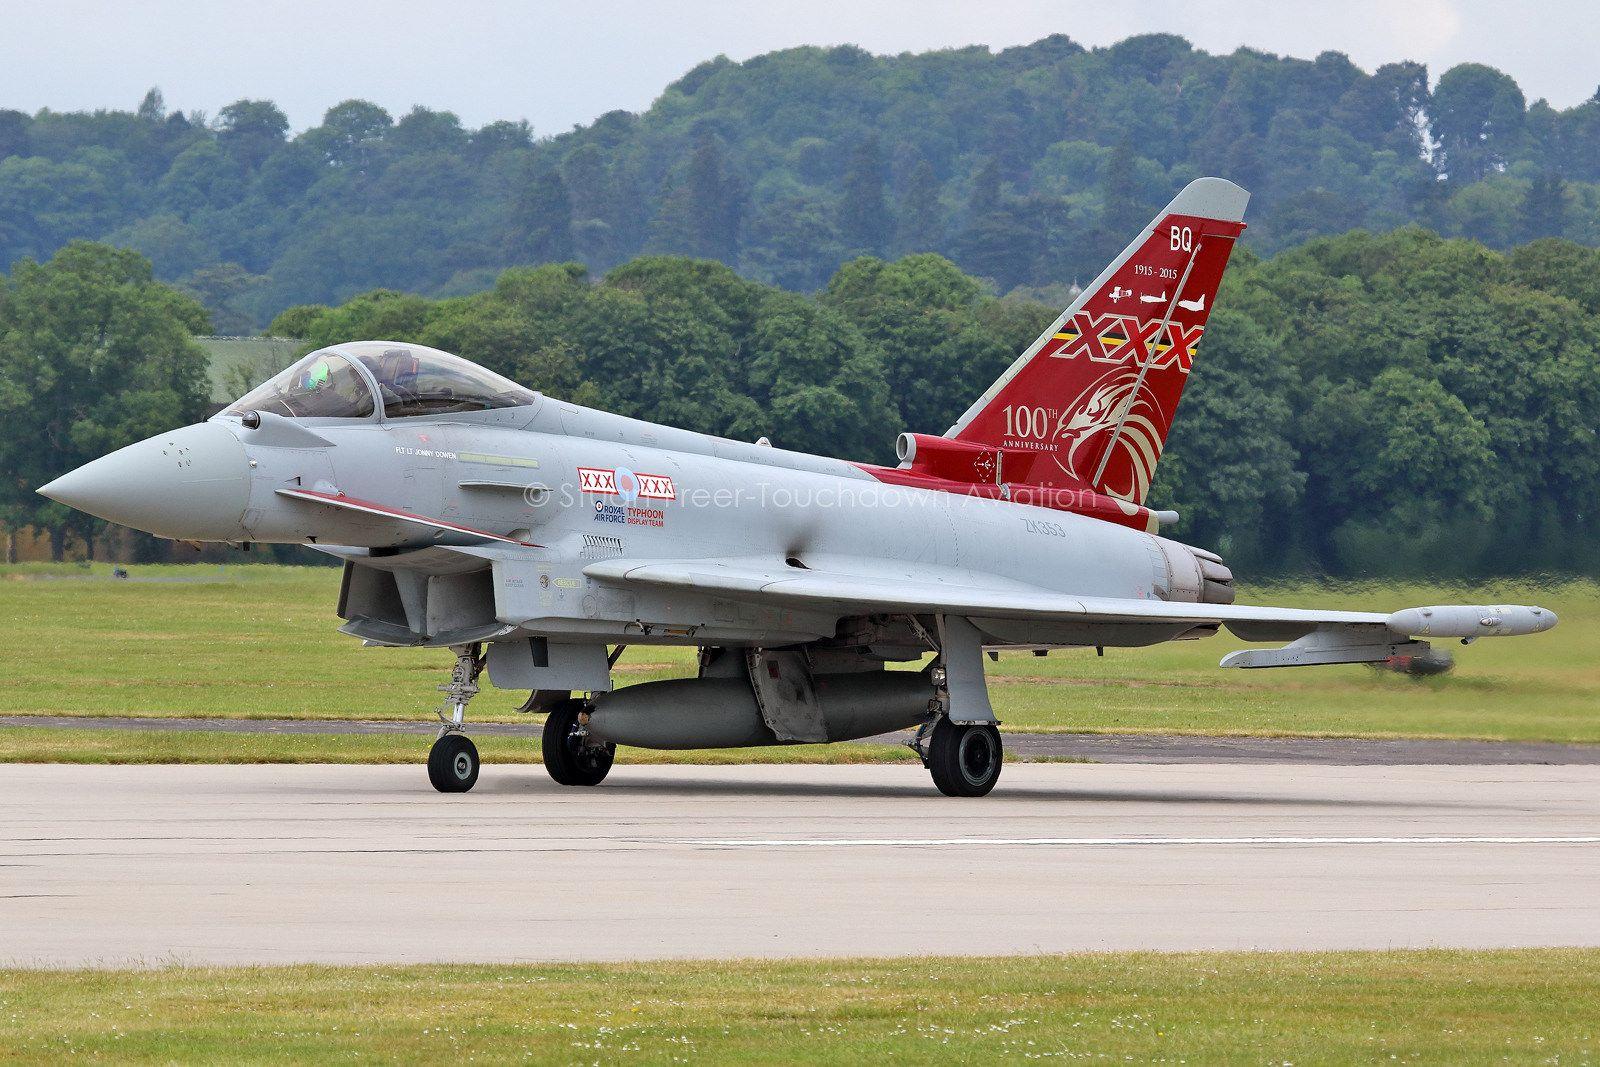 ZK353\BQ Typhoon FGR4 29(R) Squadron, RAF Coningsby